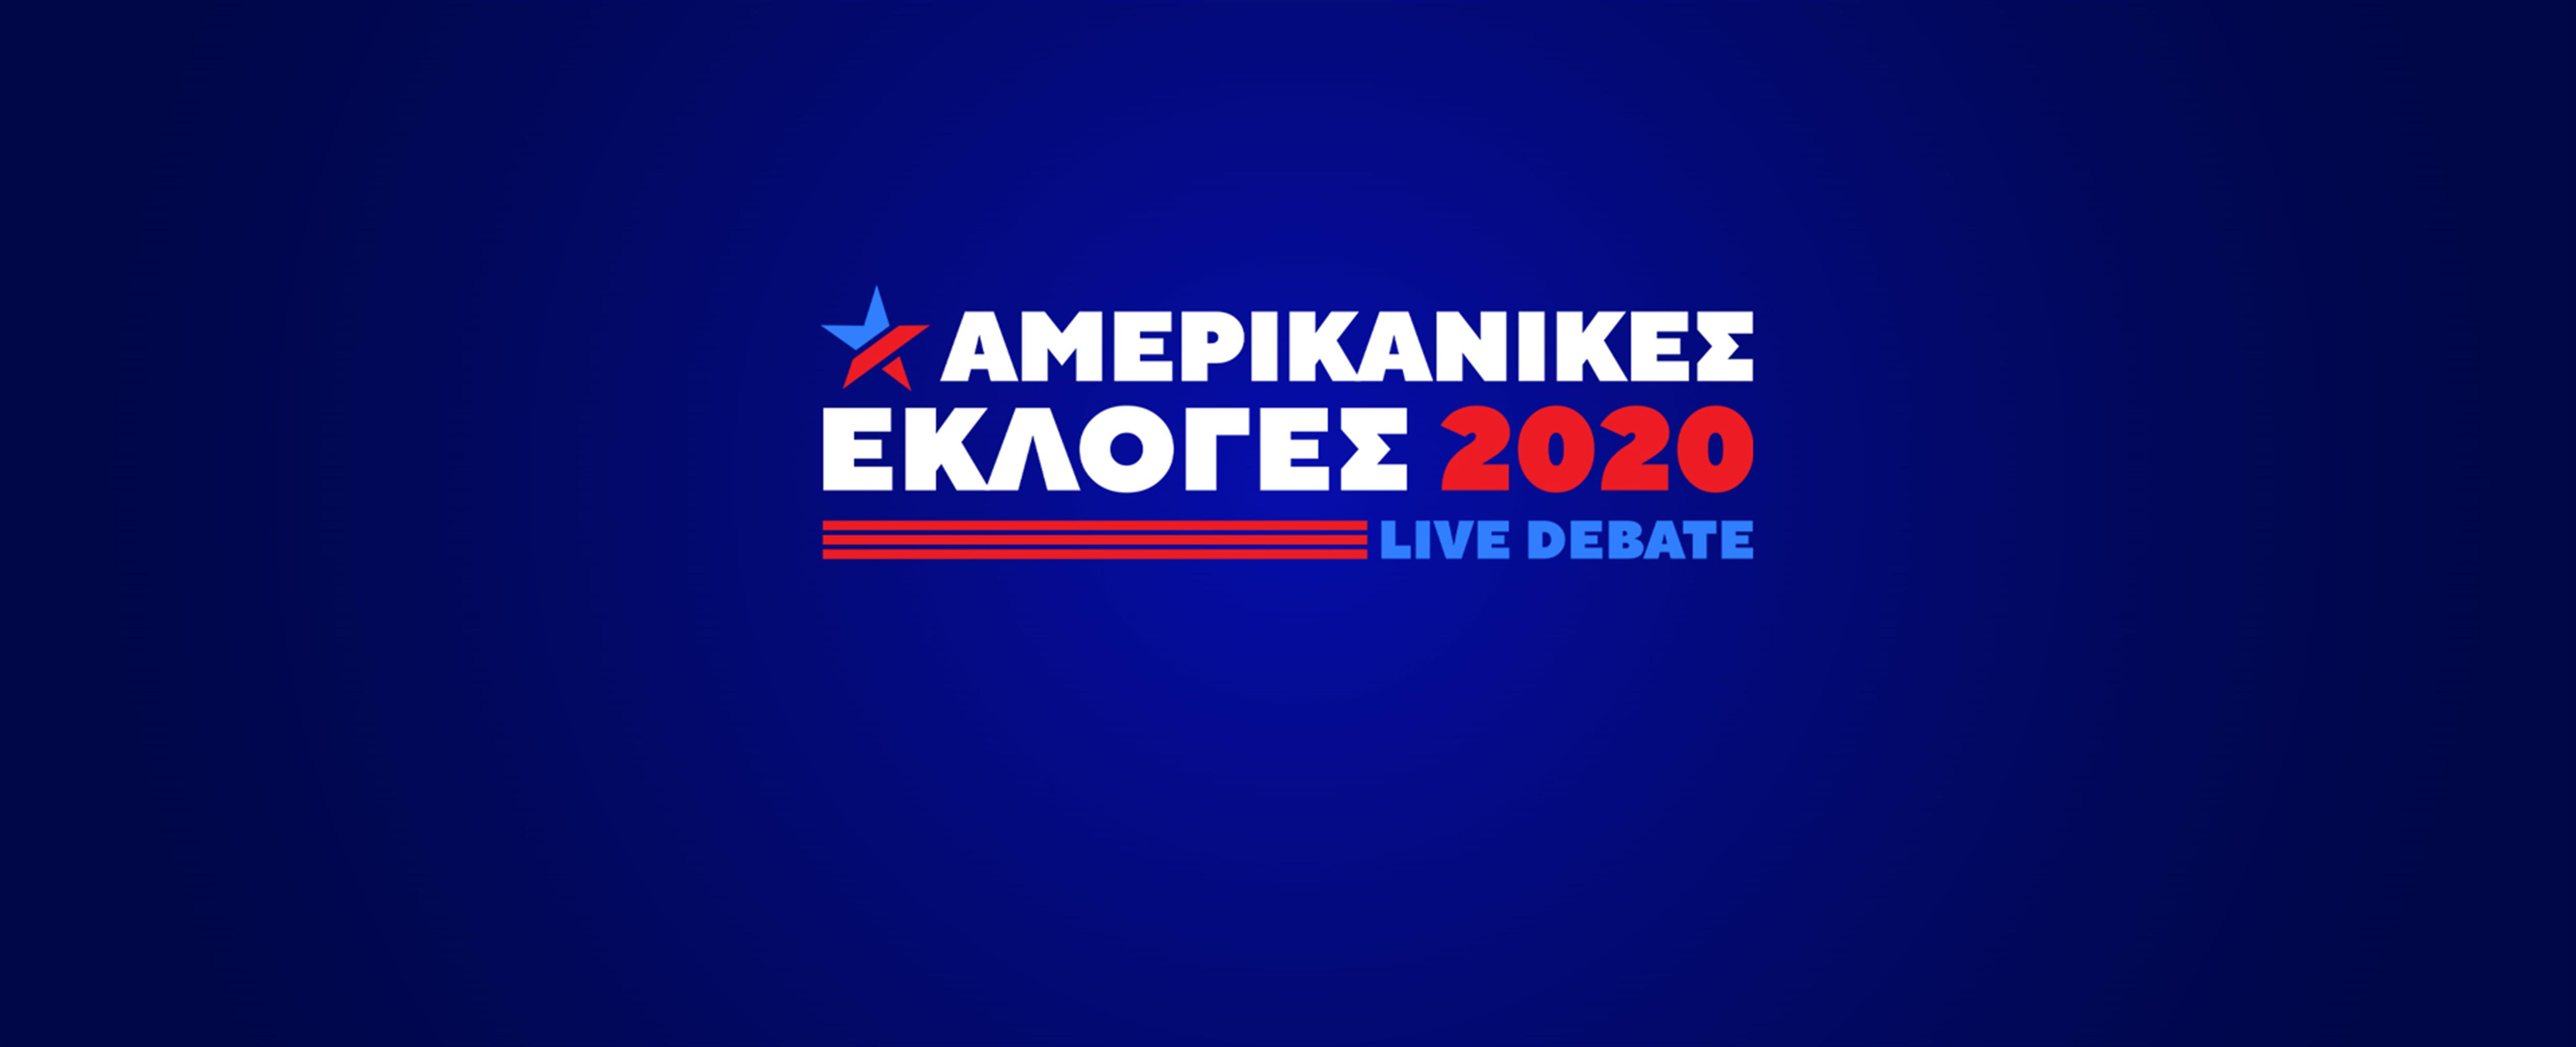 LIVE DEBATE - ΑΜΕΡΙΚΑΝΙΚΕΣ ΕΚΛΟΓΕΣ 2020